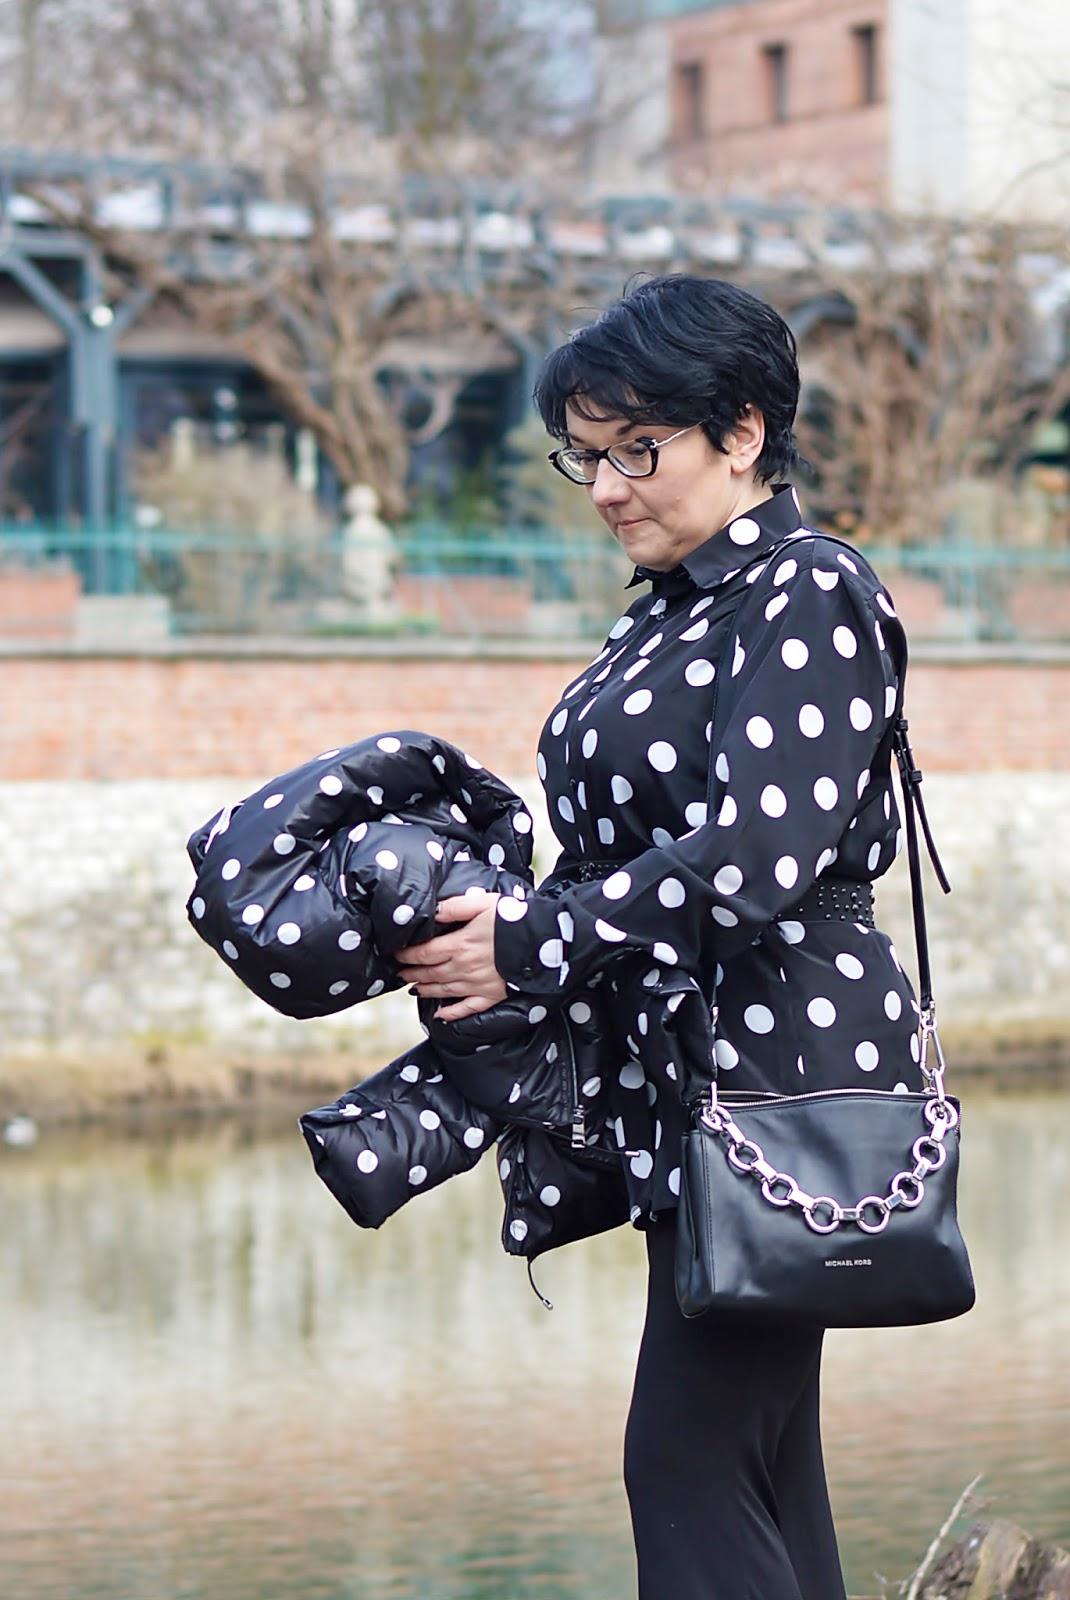 Michael Kors bag, polka dots, black and white style